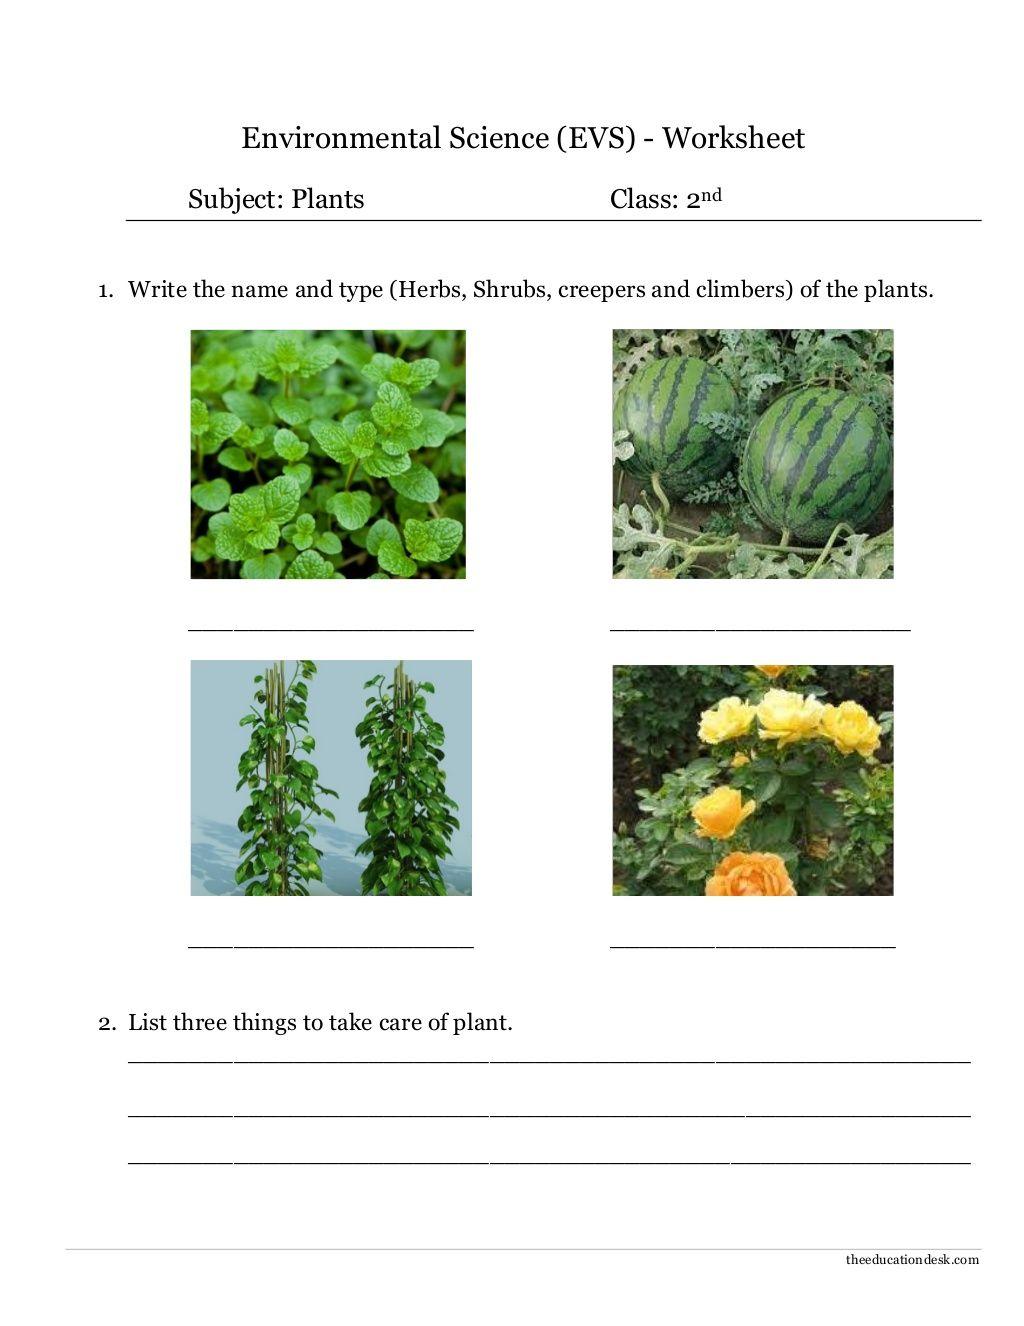 Environmental Science (EVS) : Plants Worksheet (Class II)   Plants  worksheets [ 1326 x 1024 Pixel ]